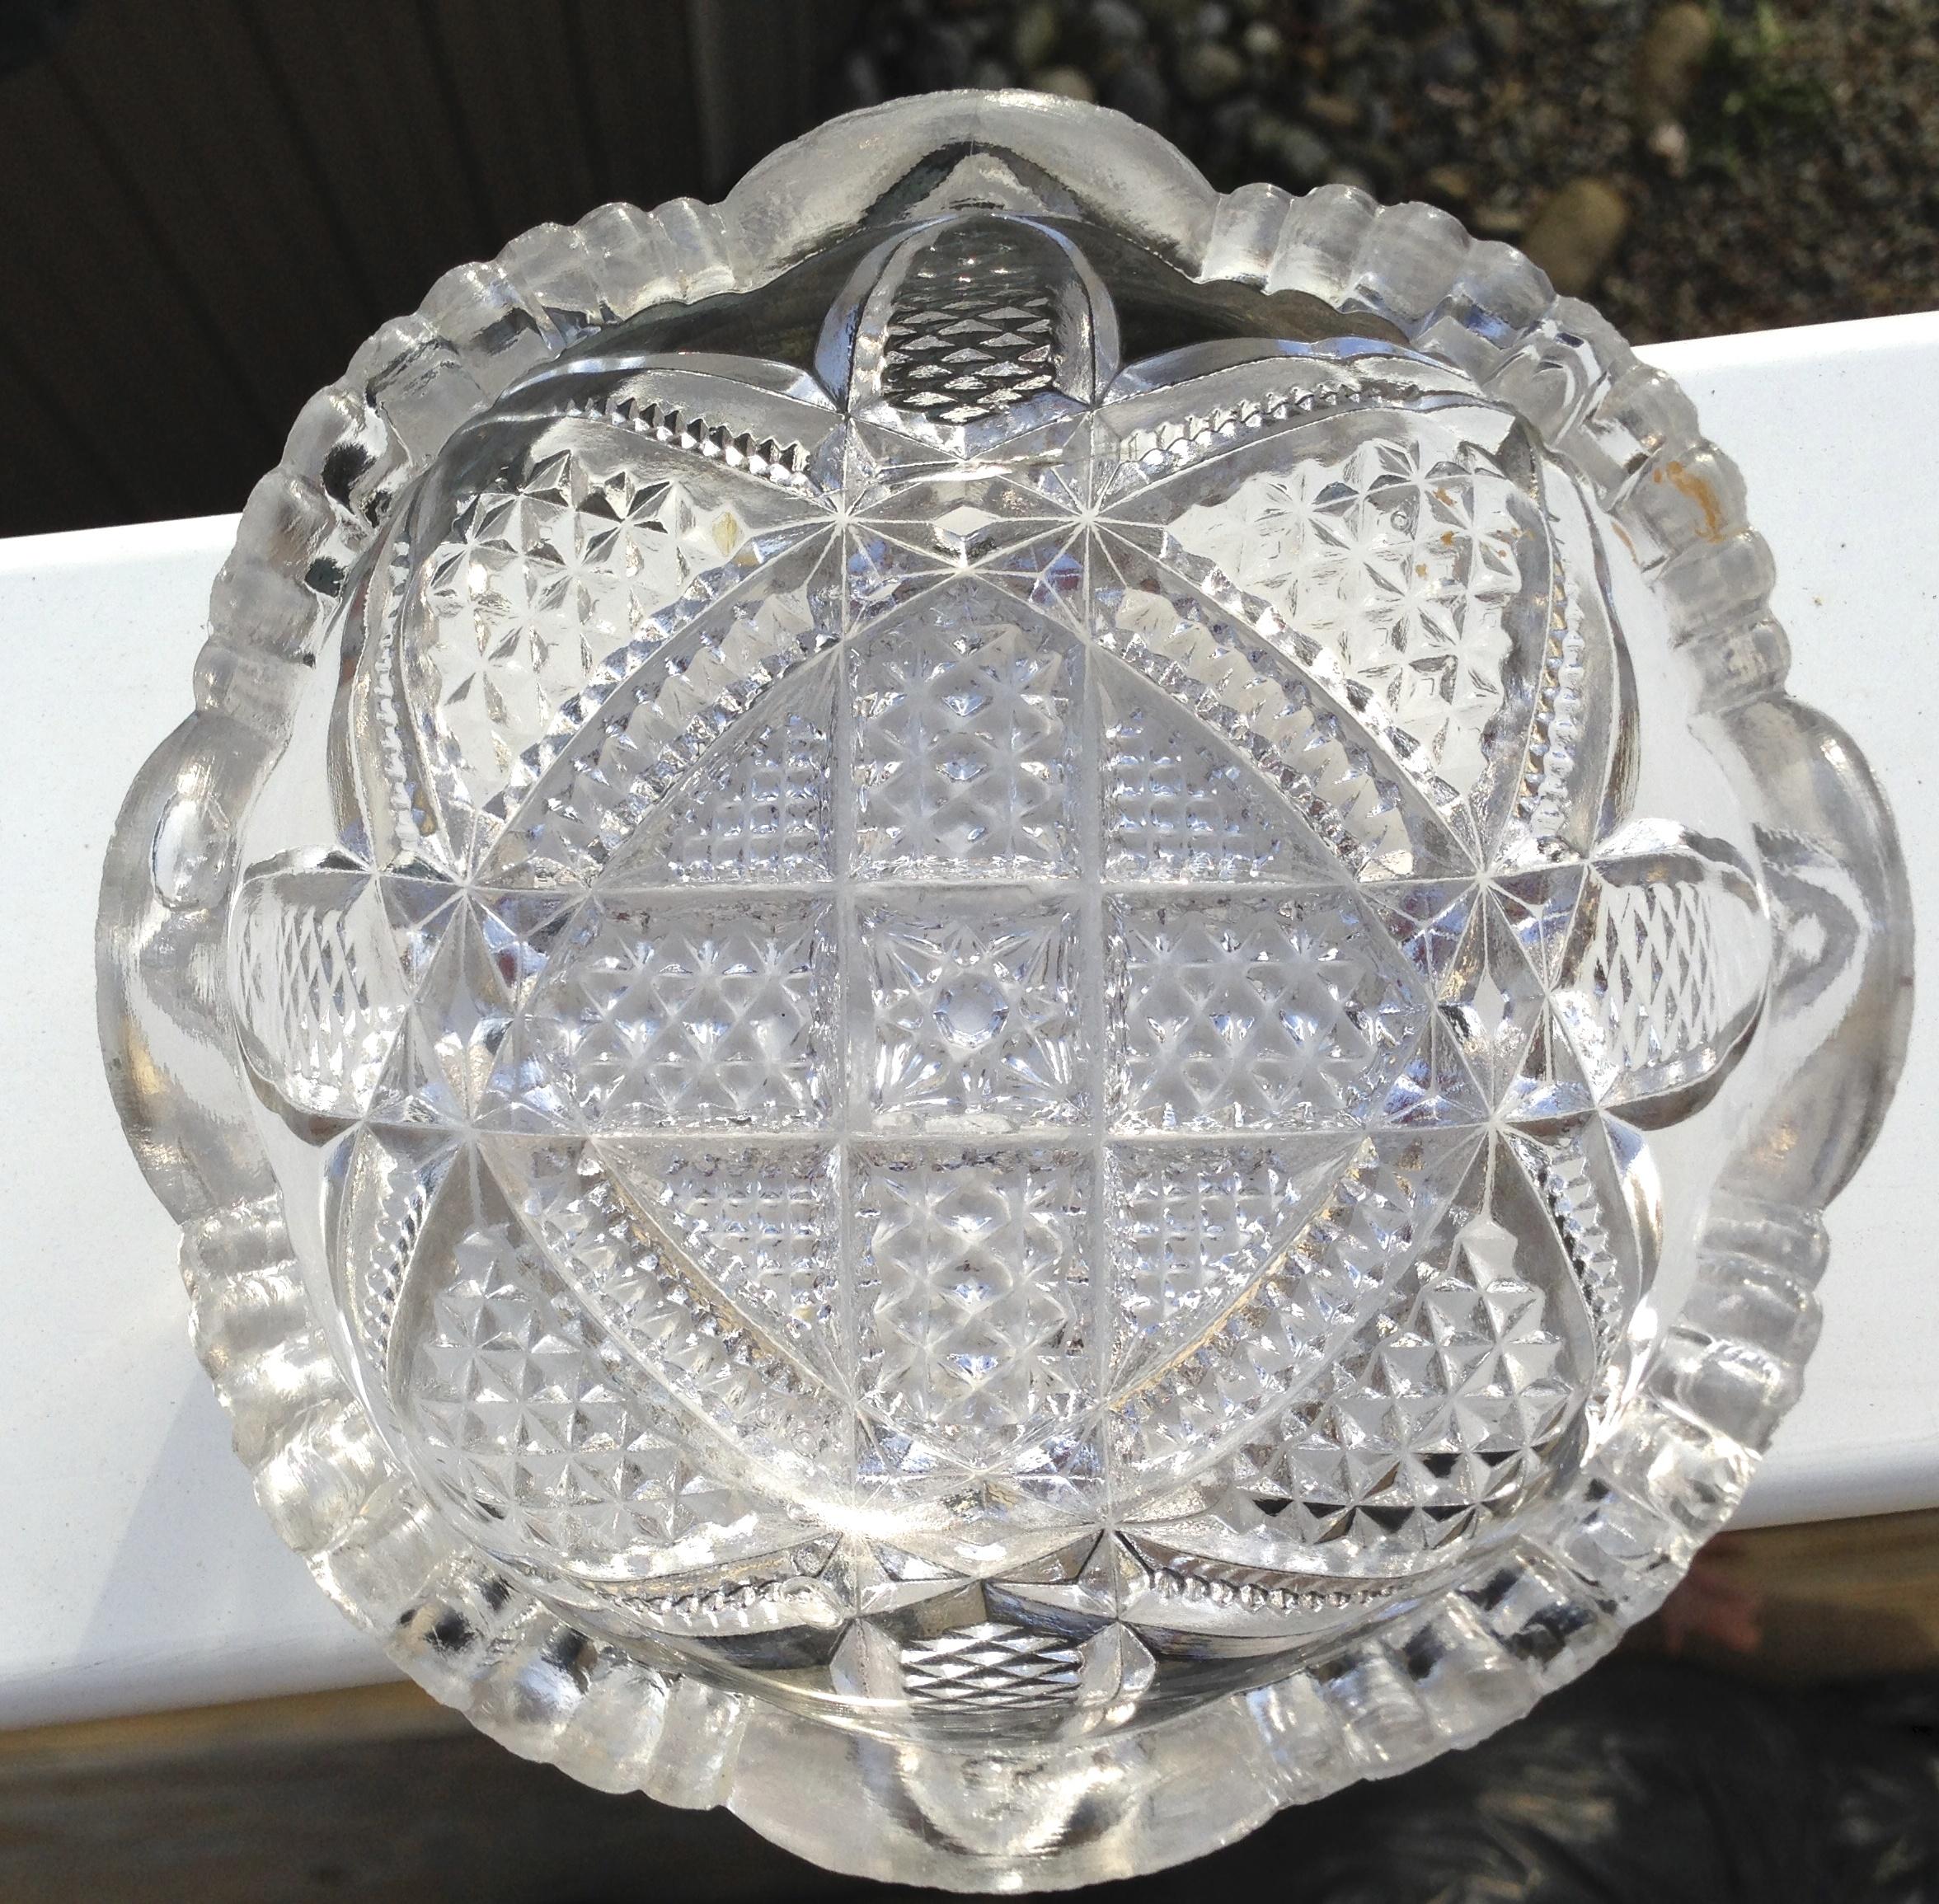 S Cut Glass Bowls